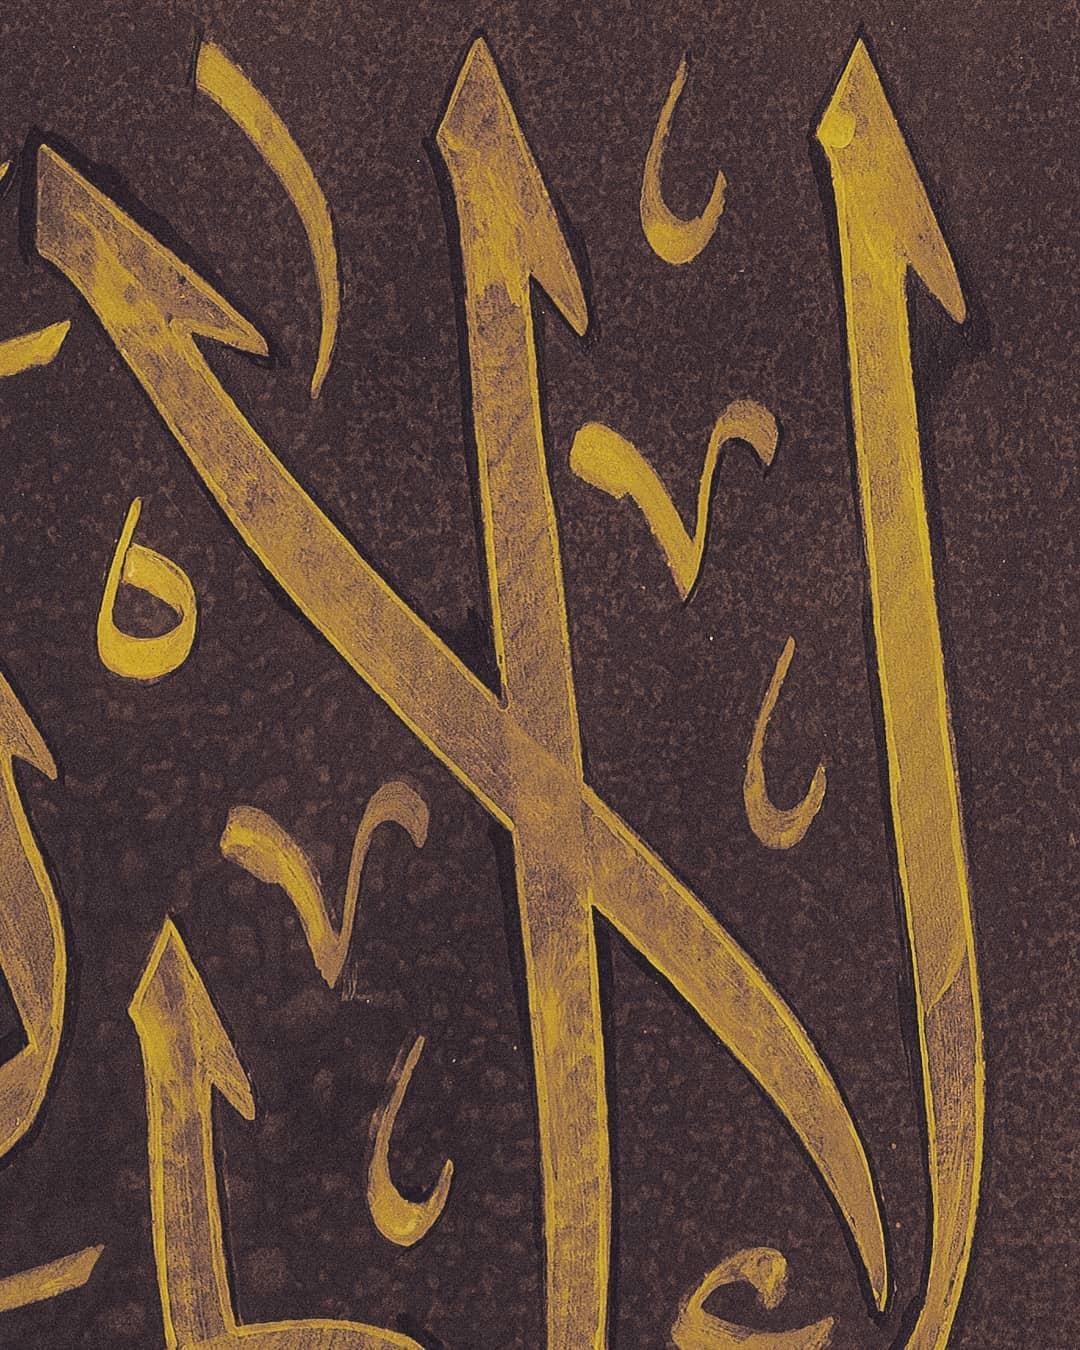 khat/hat/kat Tsulust/Thuluth Mothana Alobaydi #خط_عربي #خط_اسلامي #فن_اسلامي #فن #خط #مثنى_العبيدي #خطاط #الفن_الحديث #الفنان... 355 1